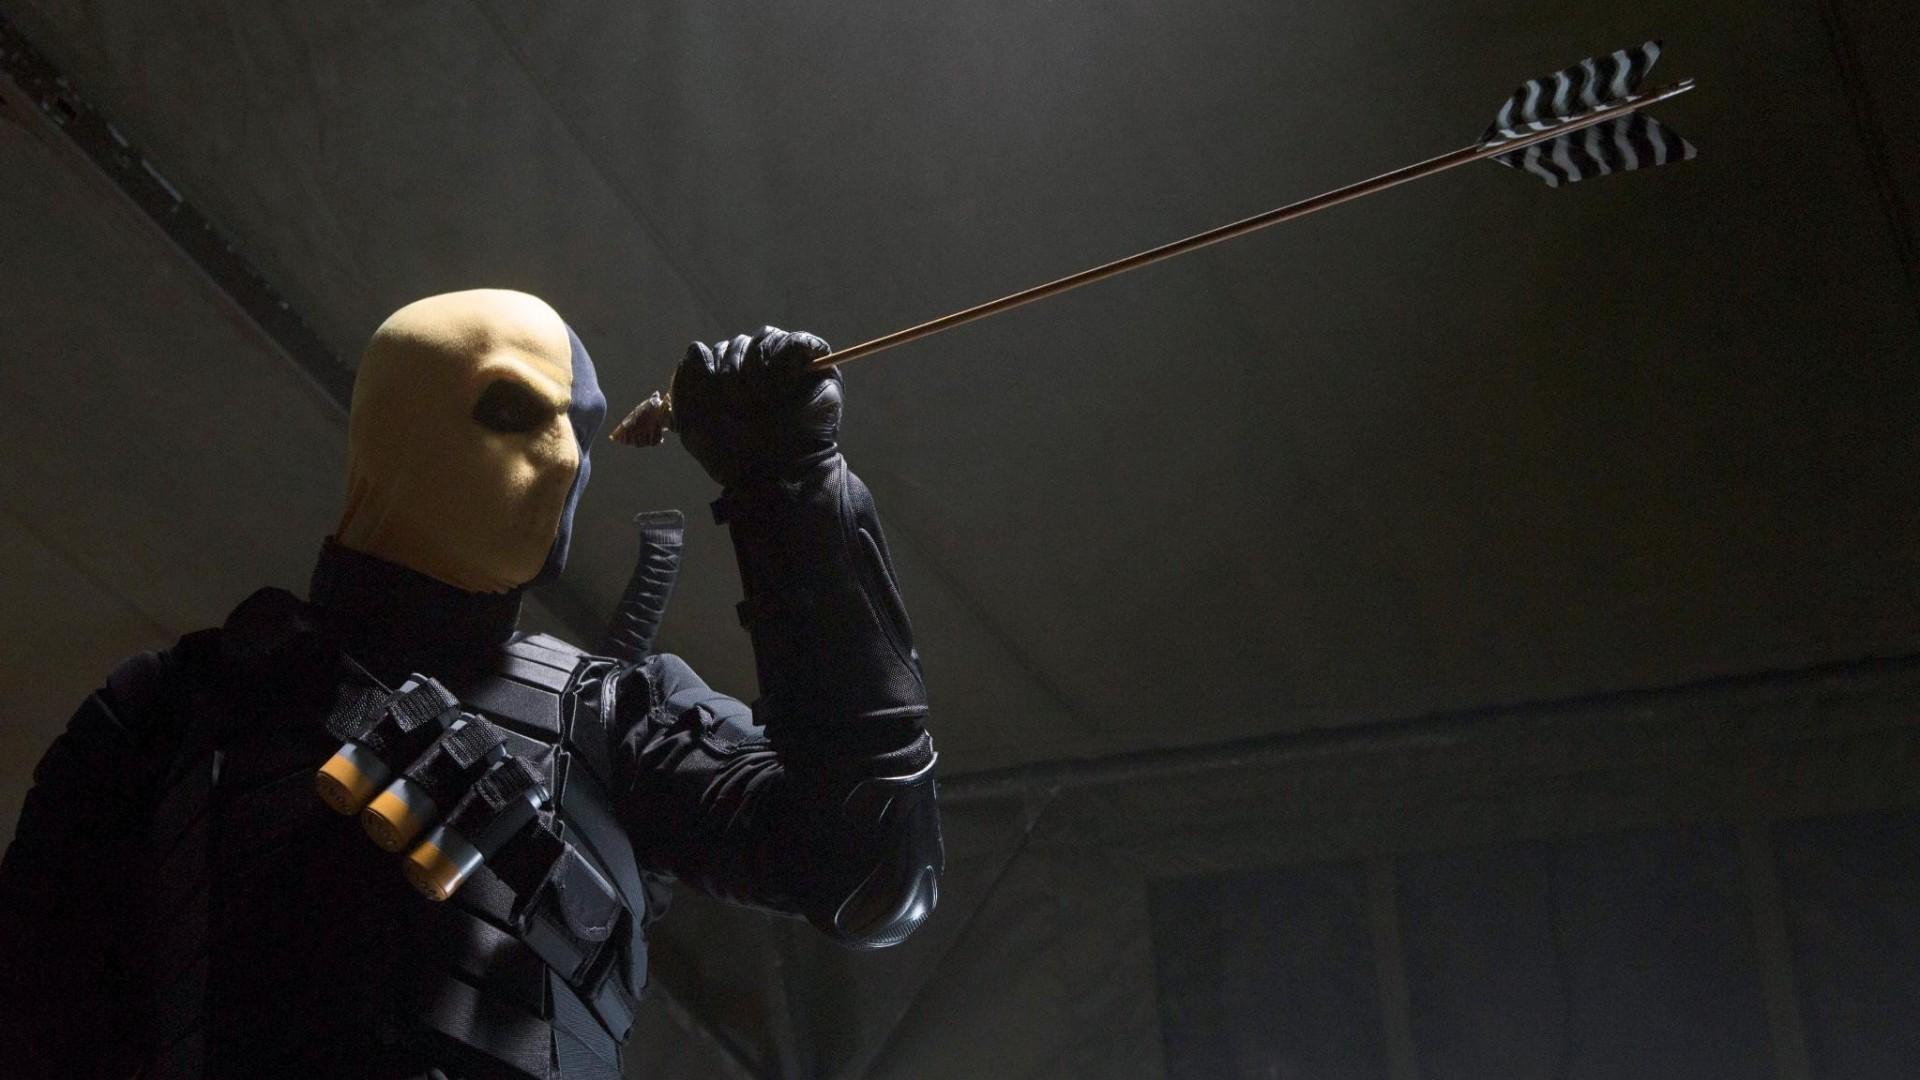 Arrow, Deathstroke, Slade Wilson Wallpapers HD / Desktop and Mobile  Backgrounds